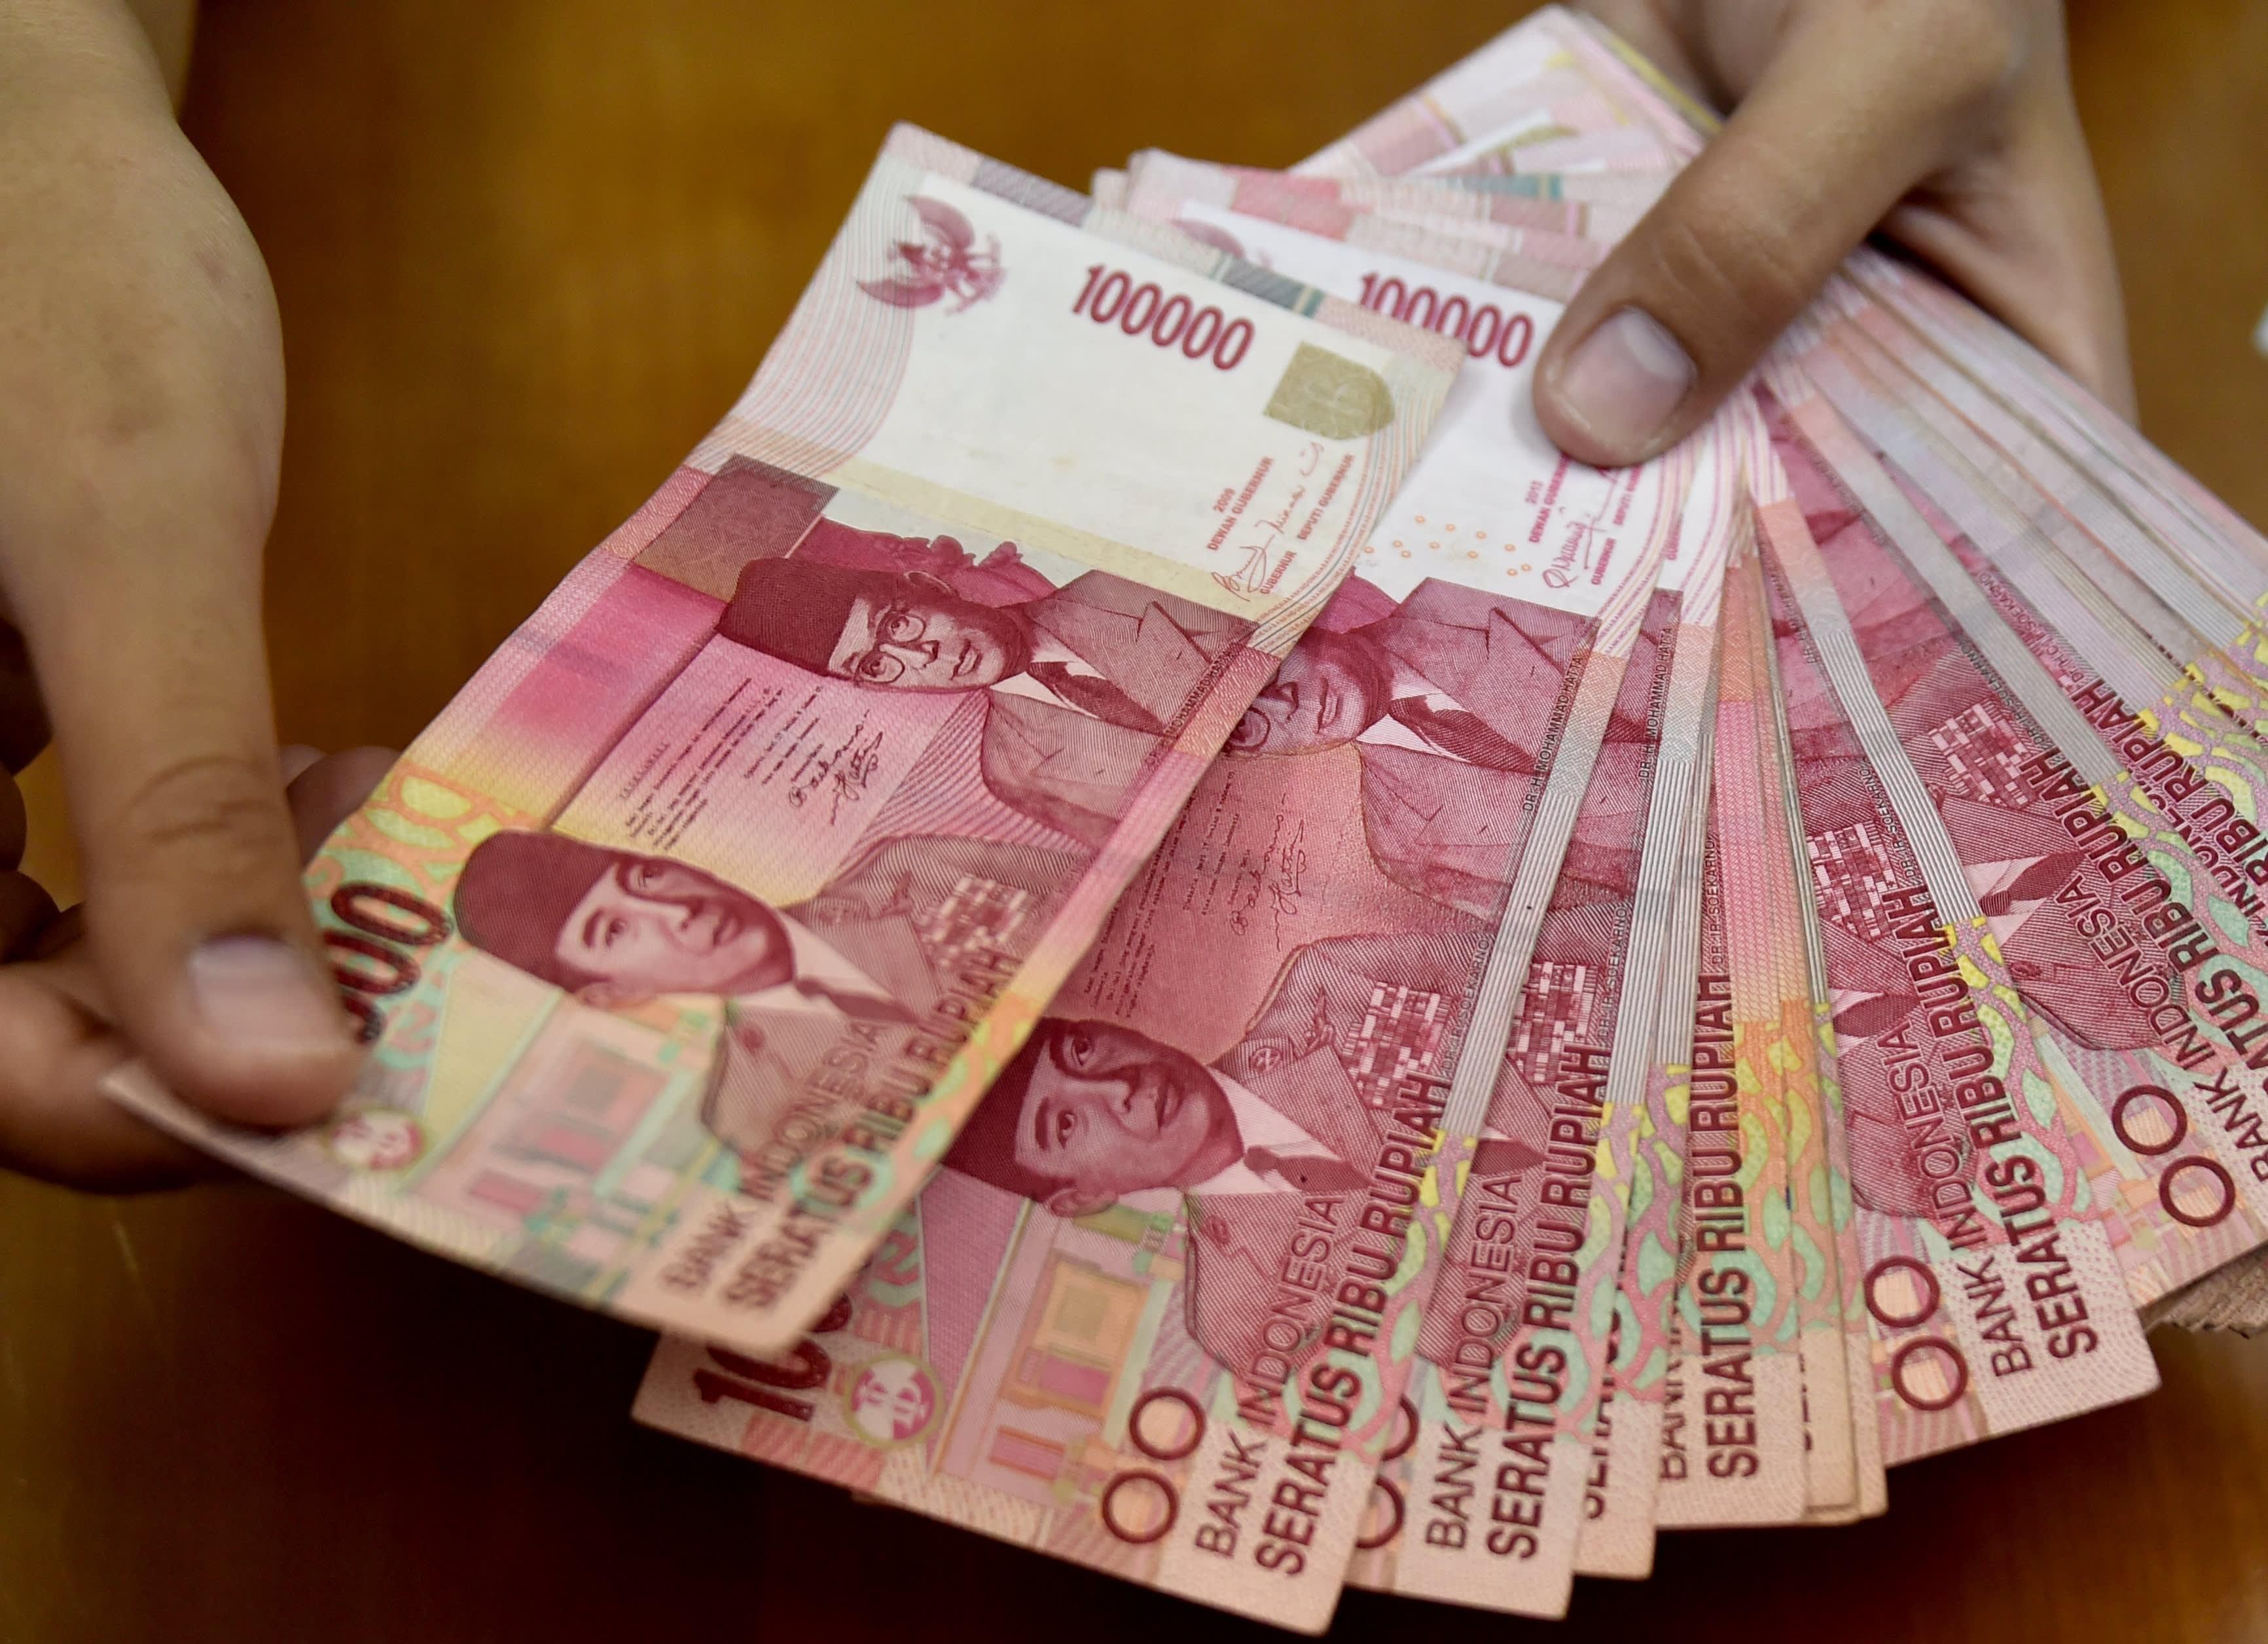 Indonesian Trade Minister Enggartiasto Lukita On Rupiah Deficits